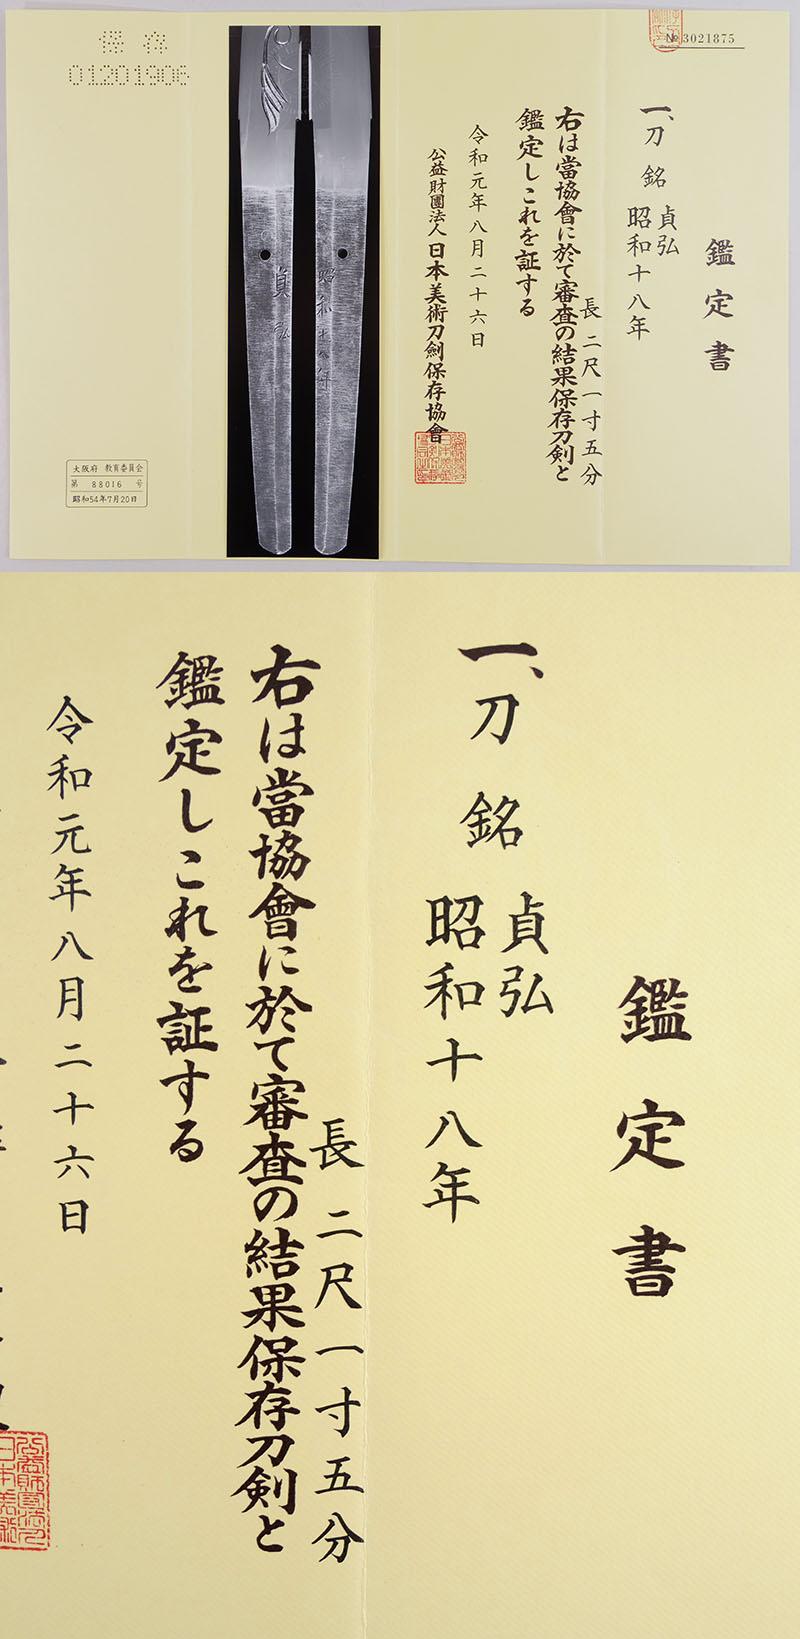 貞弘(喜多貞弘) Picture of Certificate